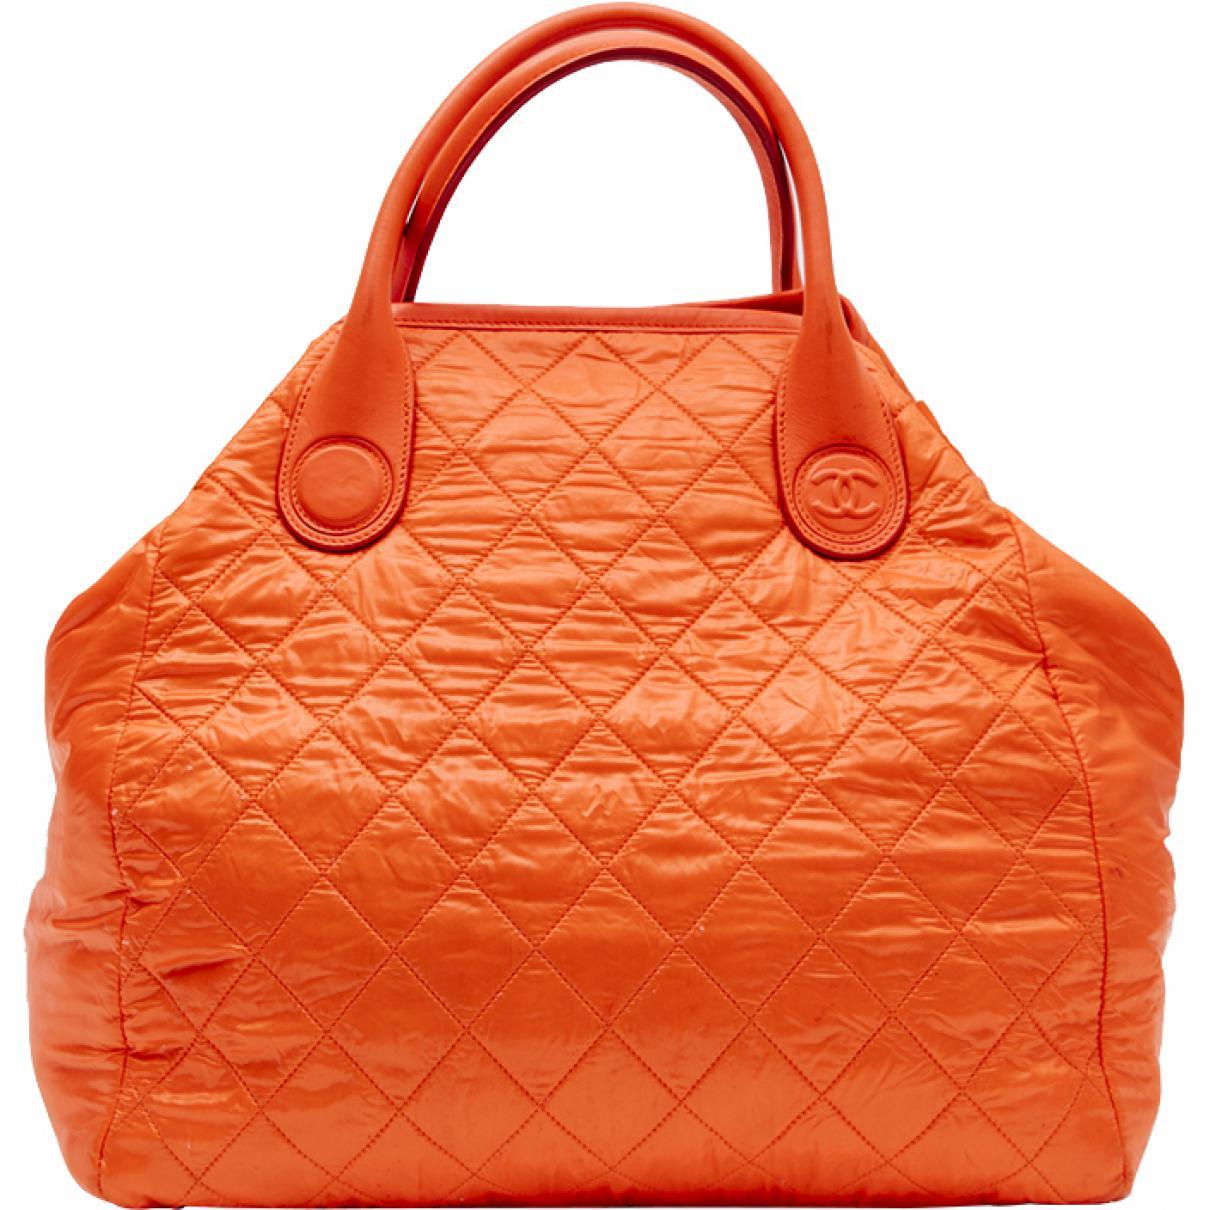 Pre-owned - Cocoon handbag Chanel BFQzJA